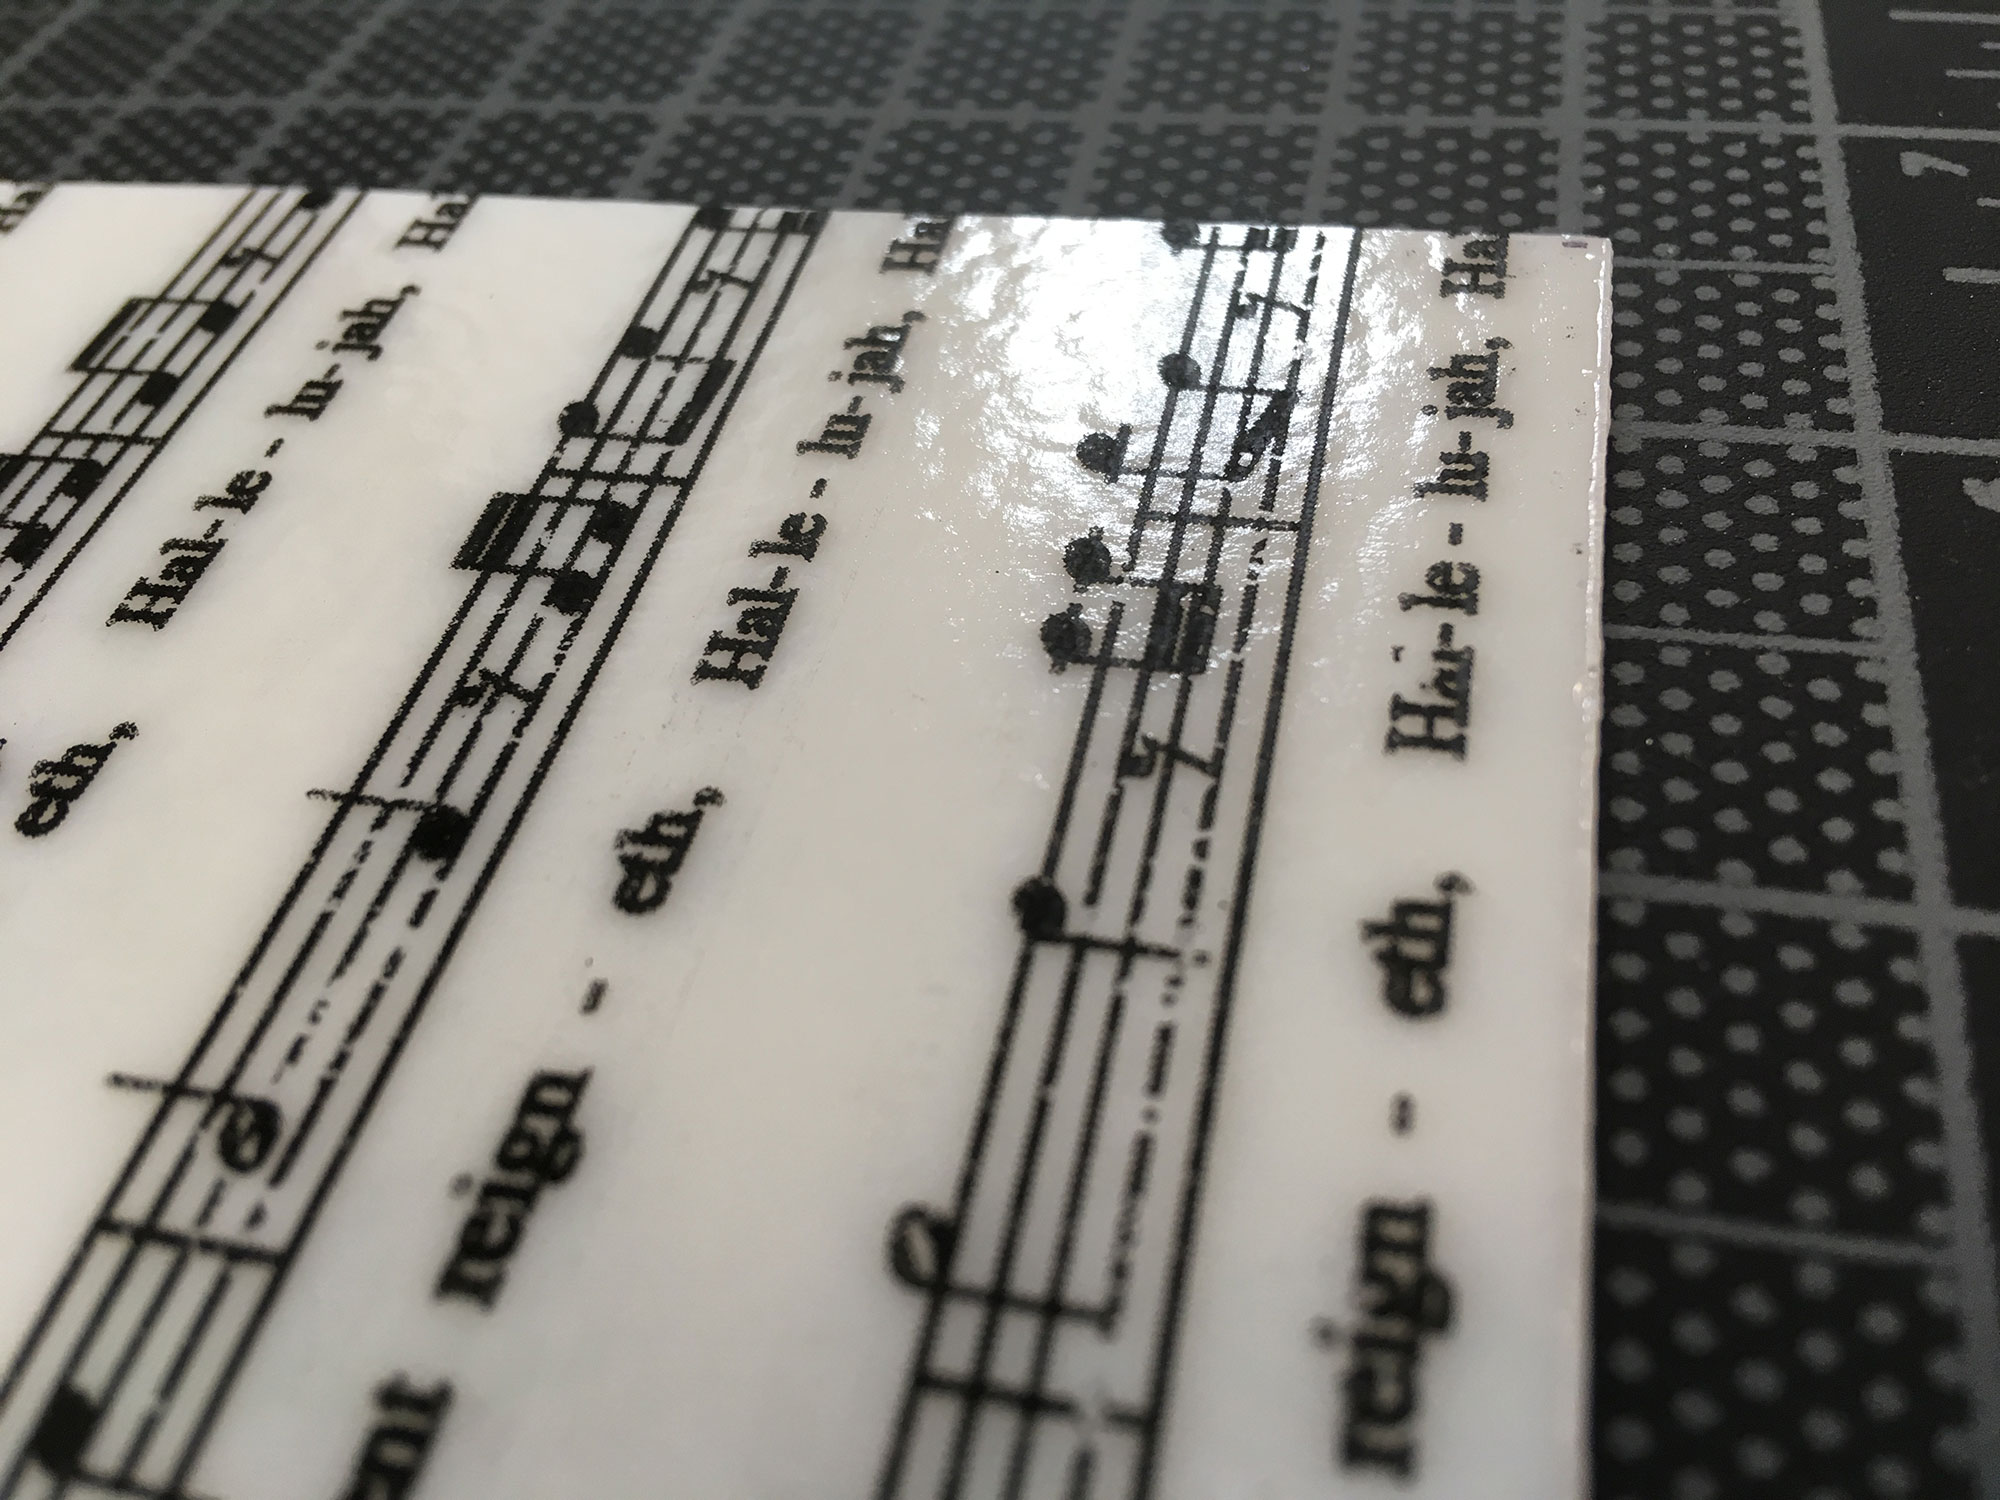 Smaller Print on Dense White